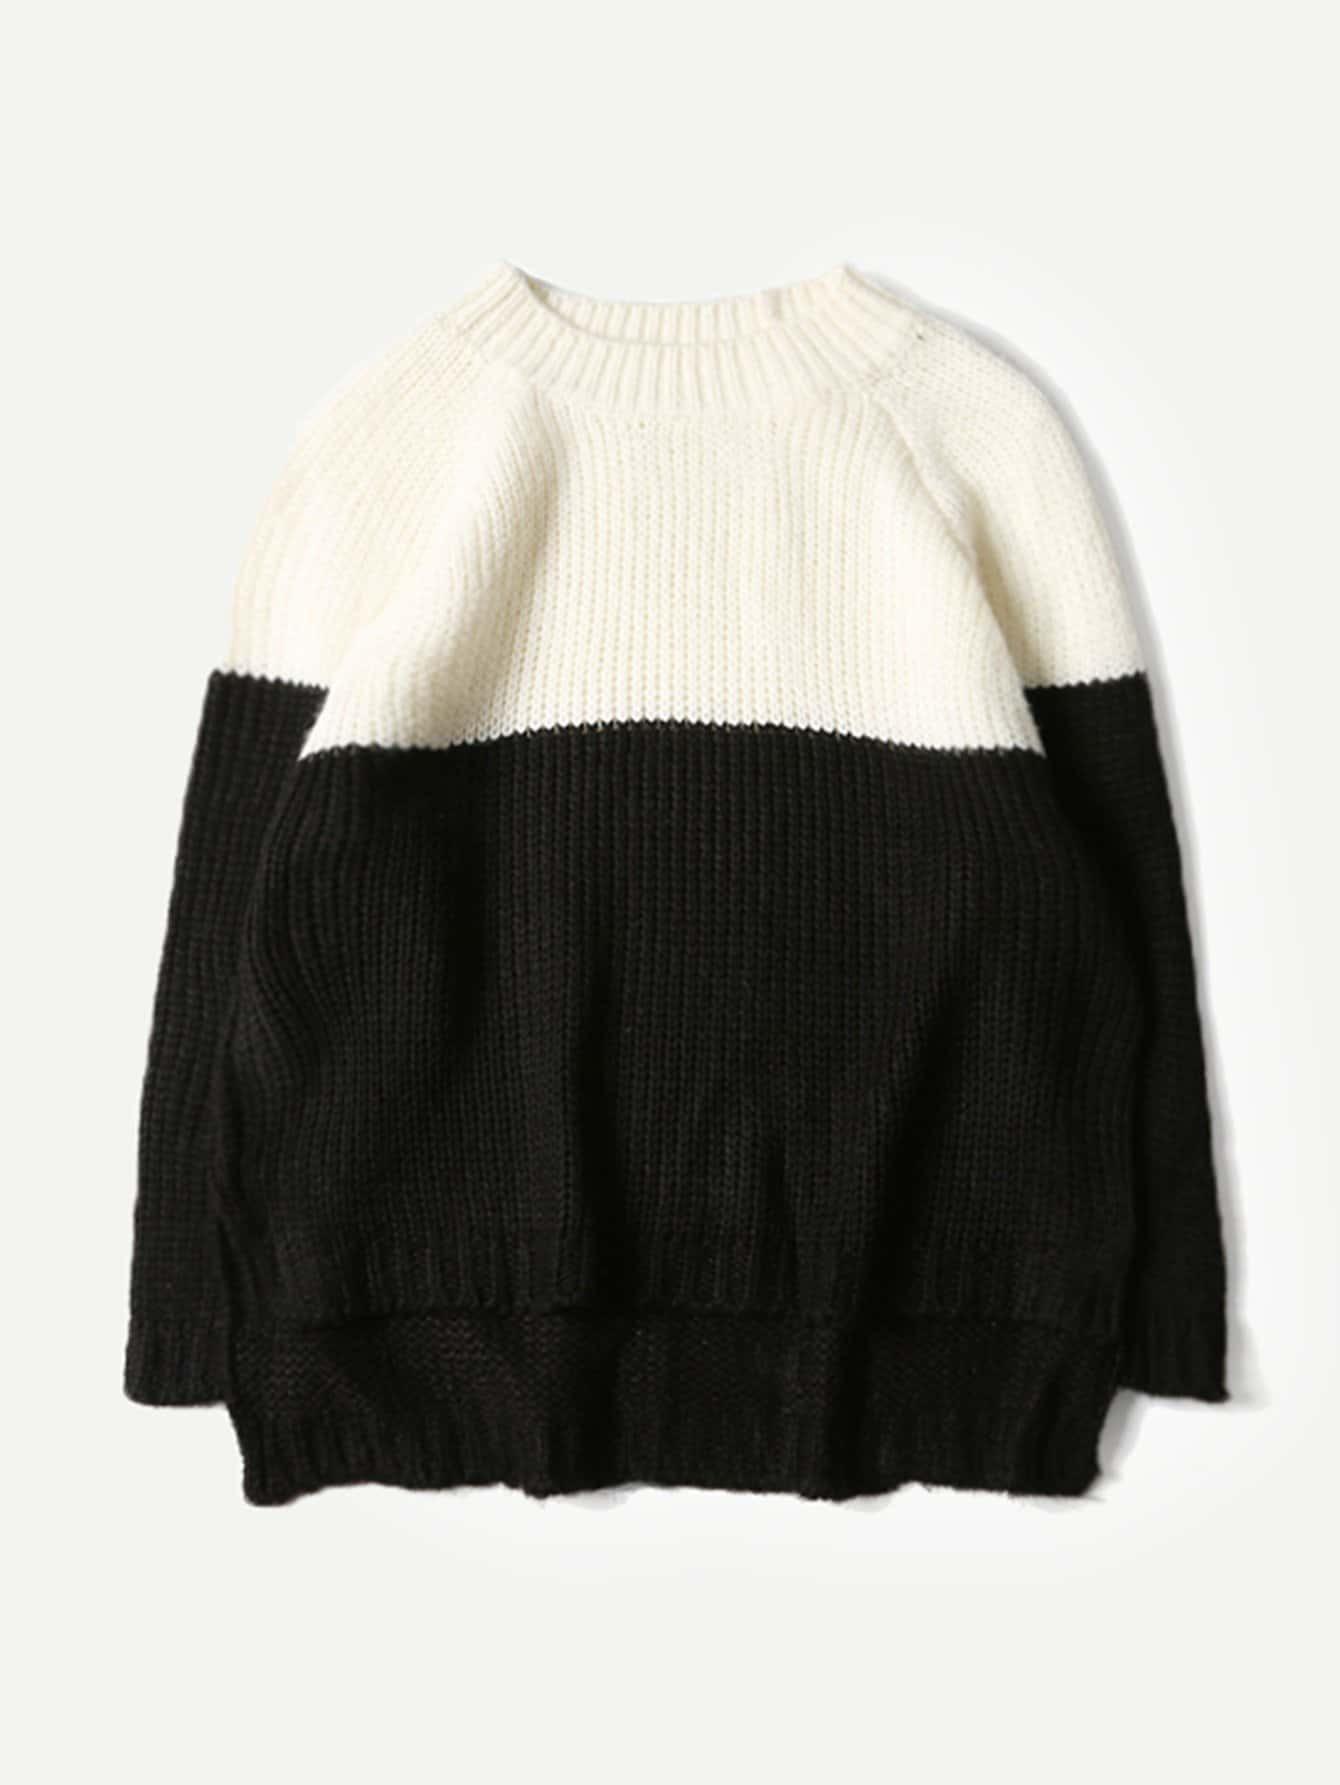 Männer Zwei Ton asymmetrischer Pullover